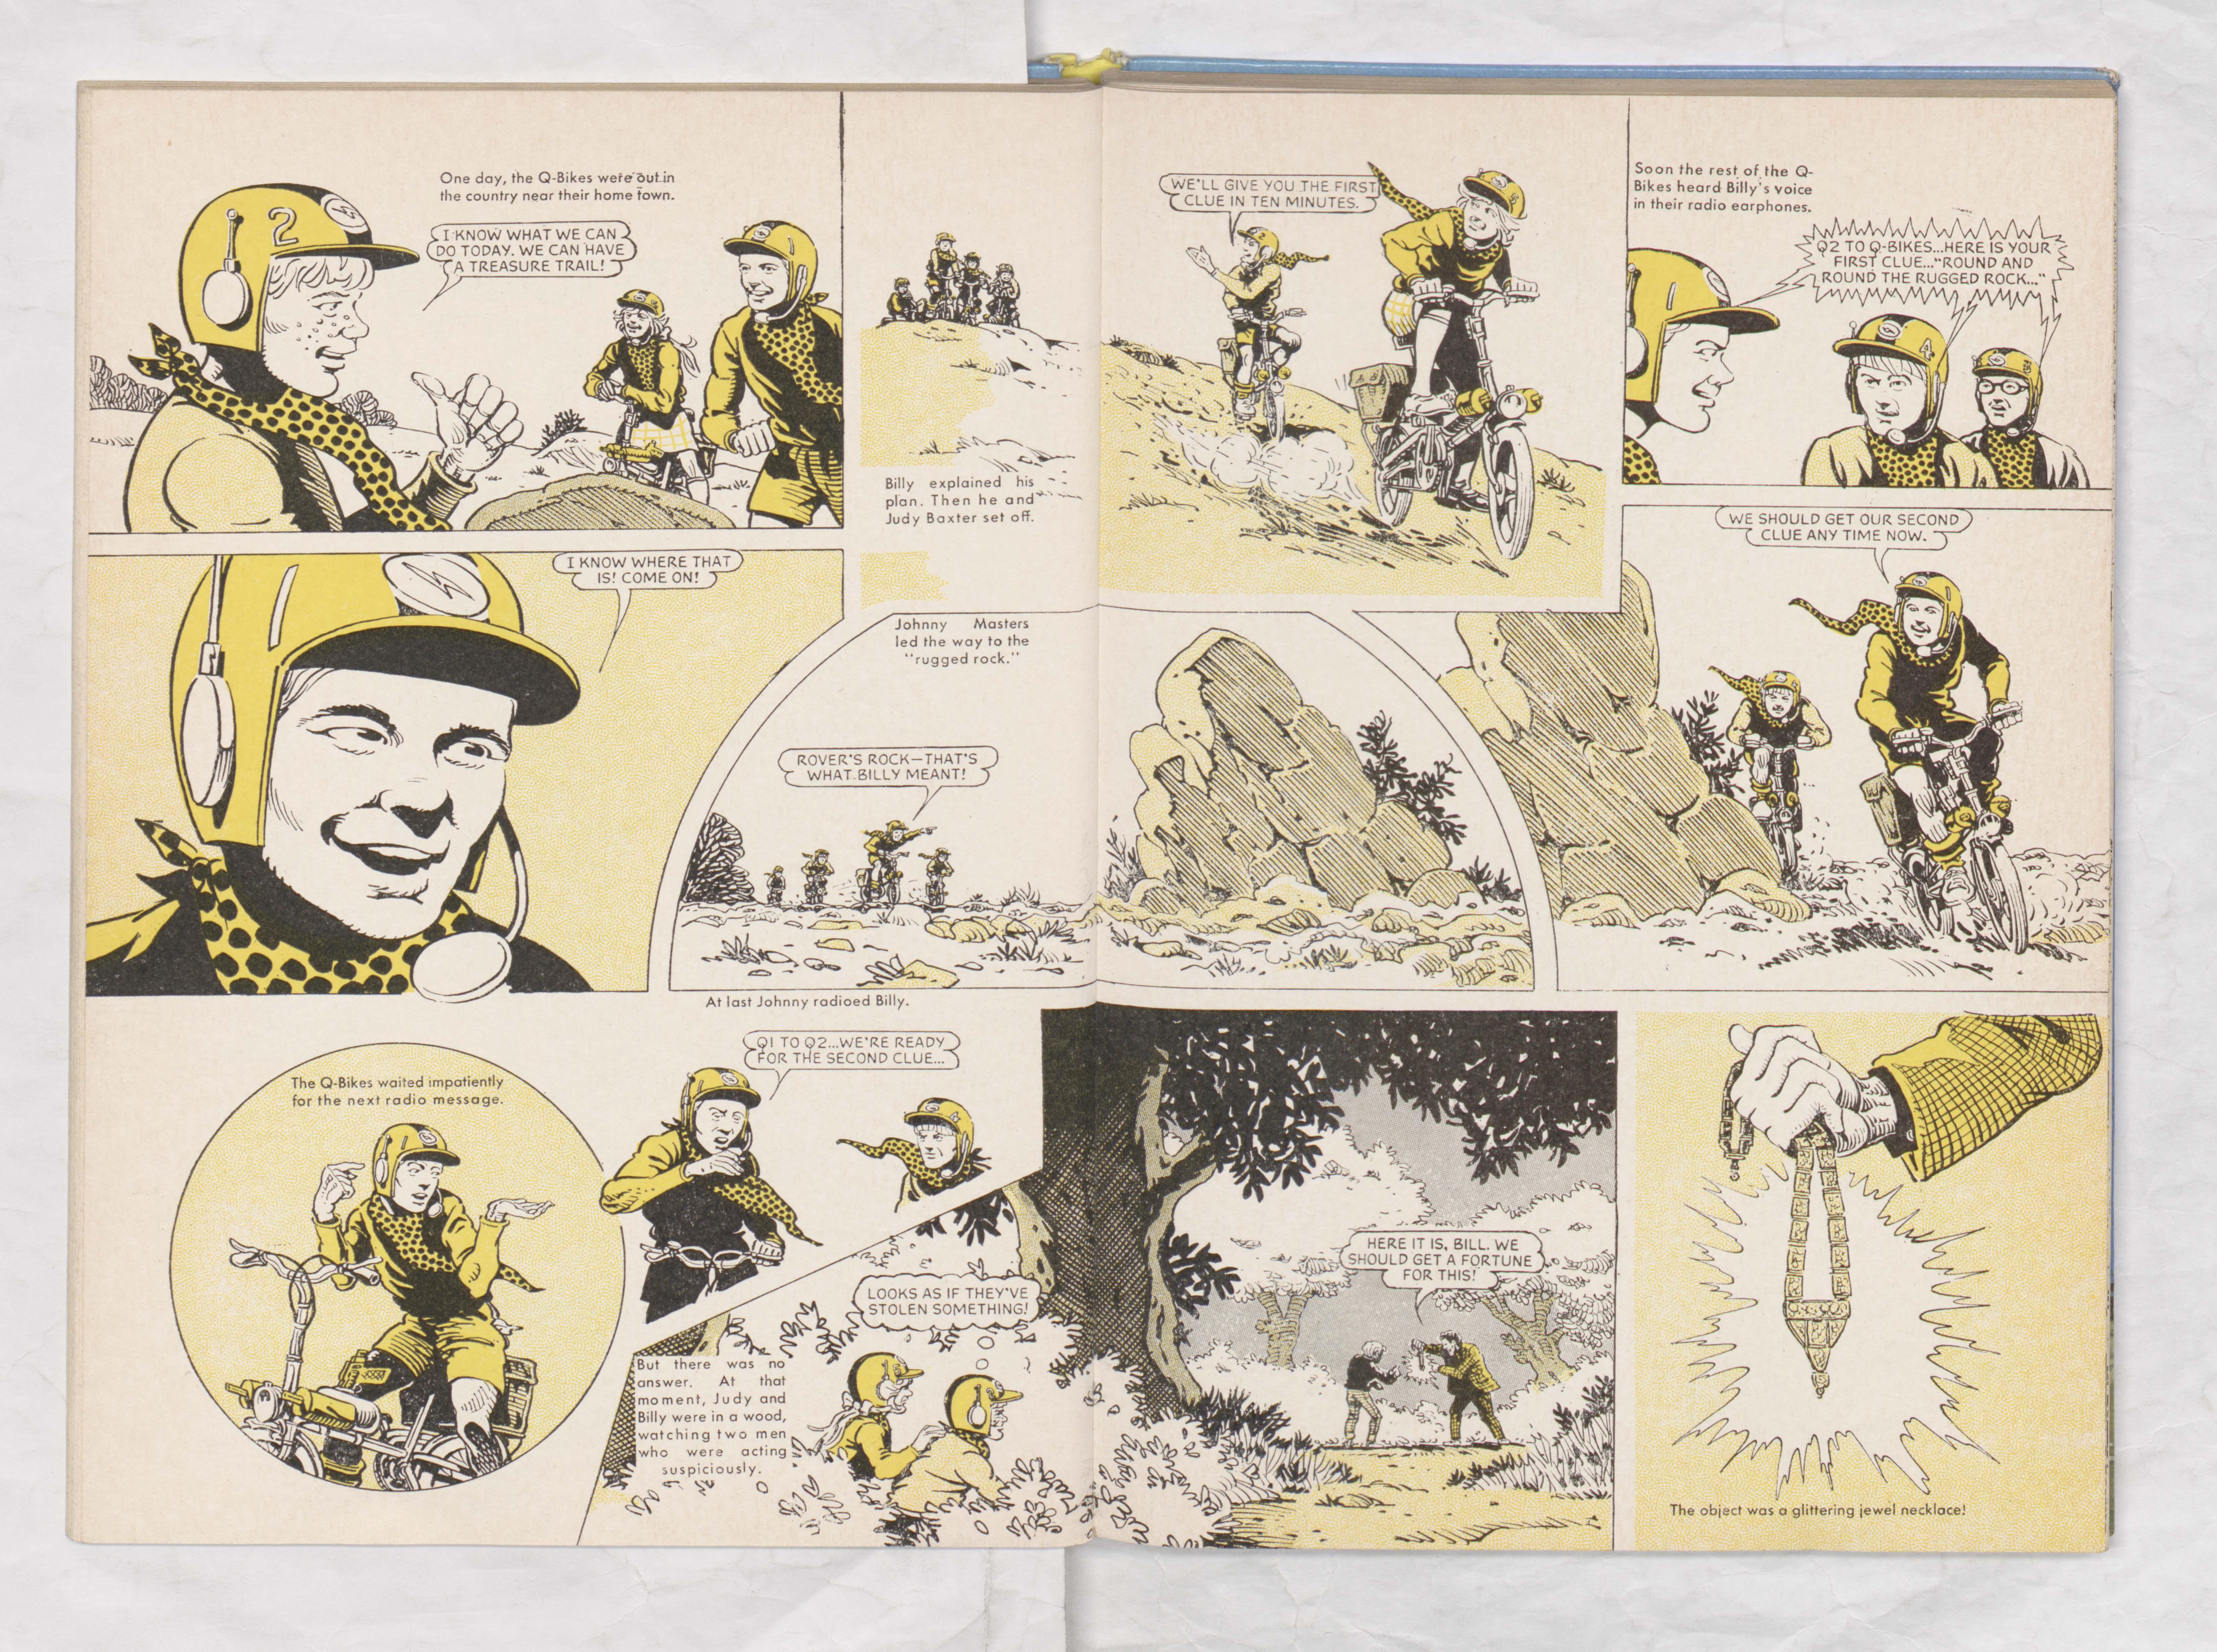 Beano Book 1970 - Q-Bikes - Page 2 + 3